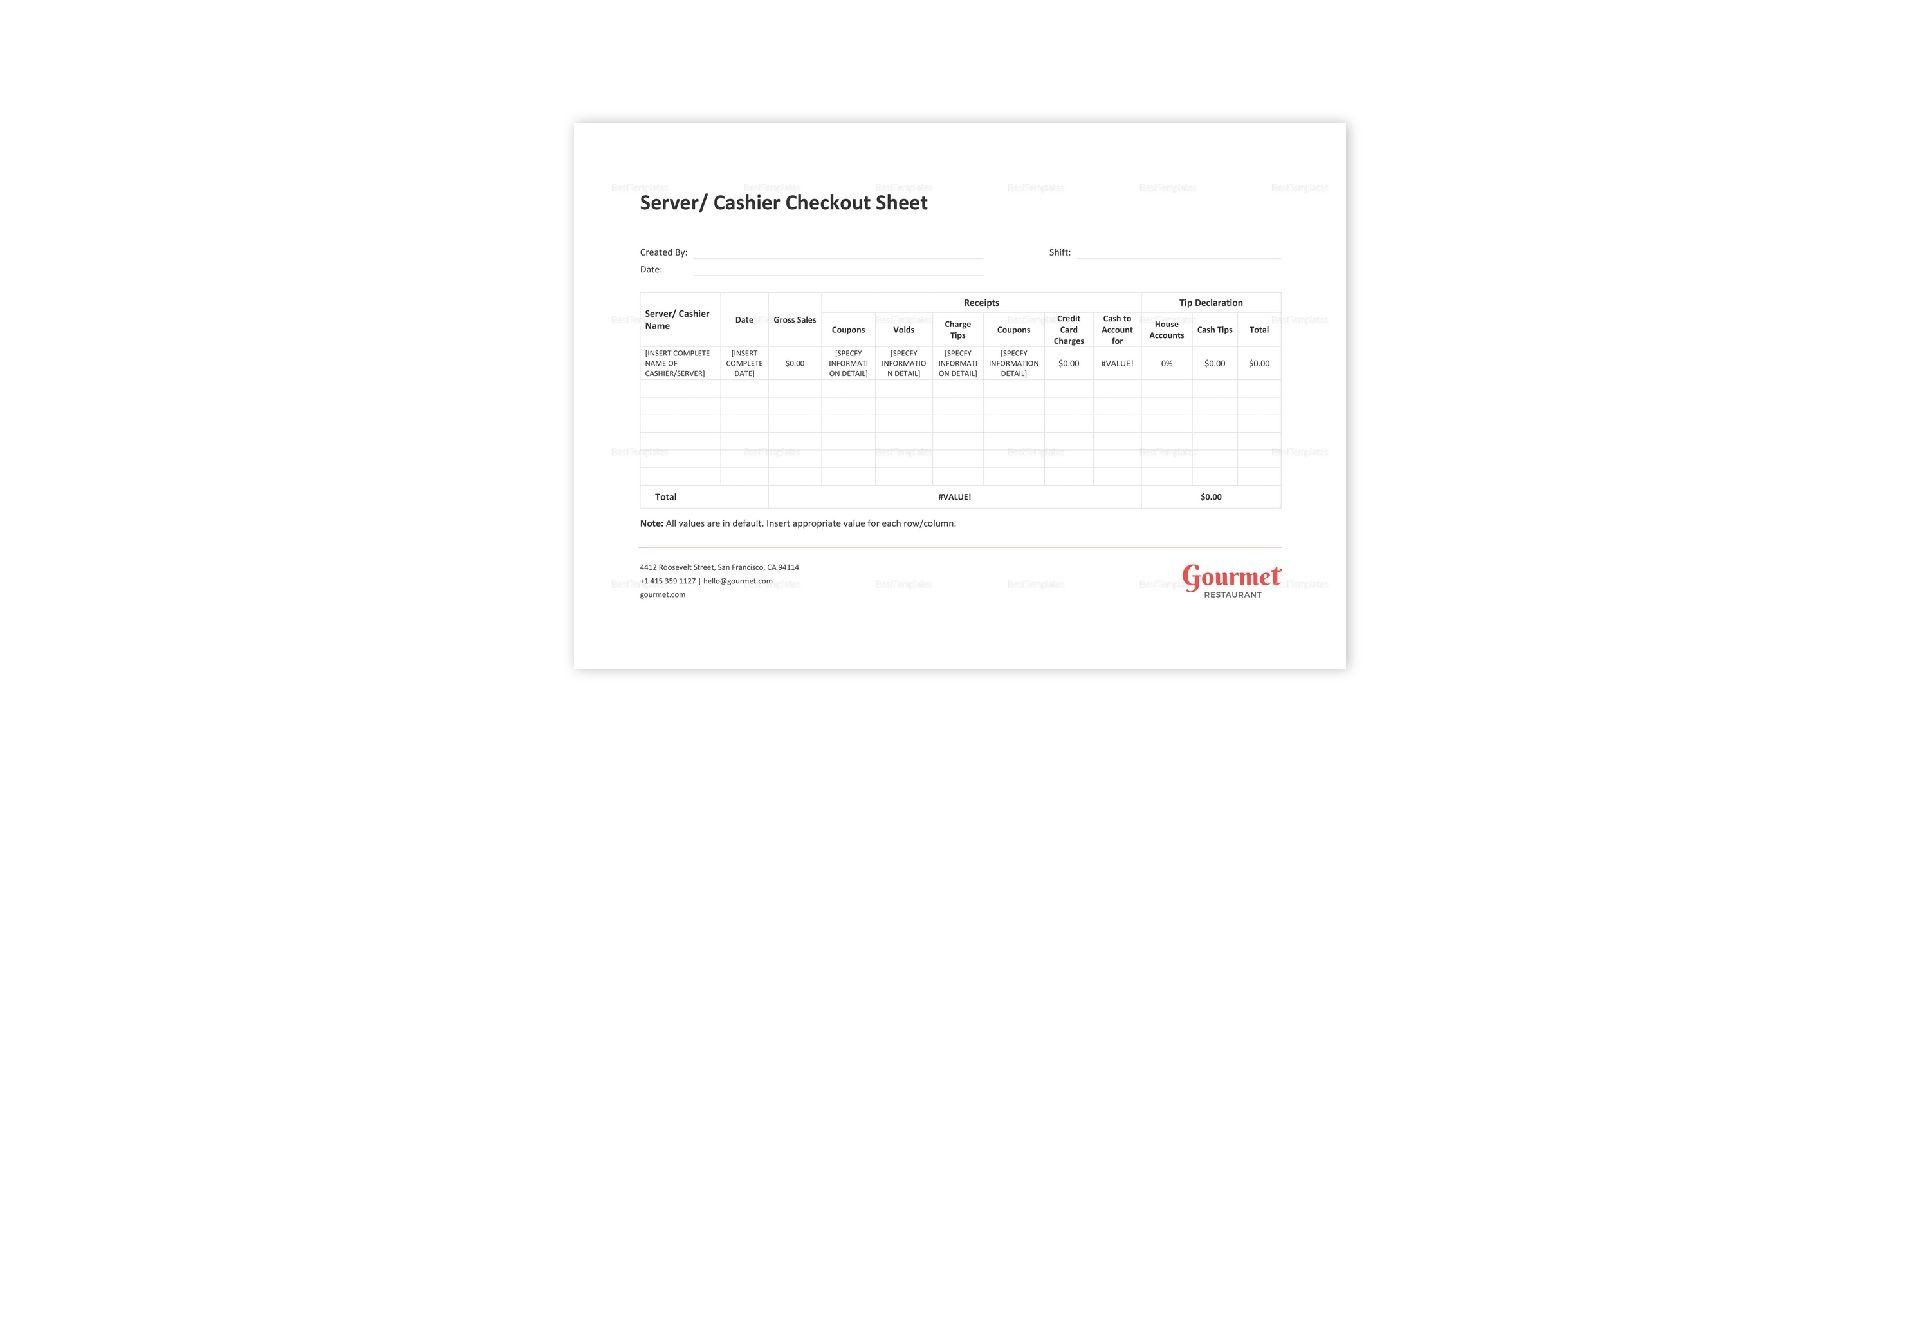 restaurant server  cashier checkout sheet template in word